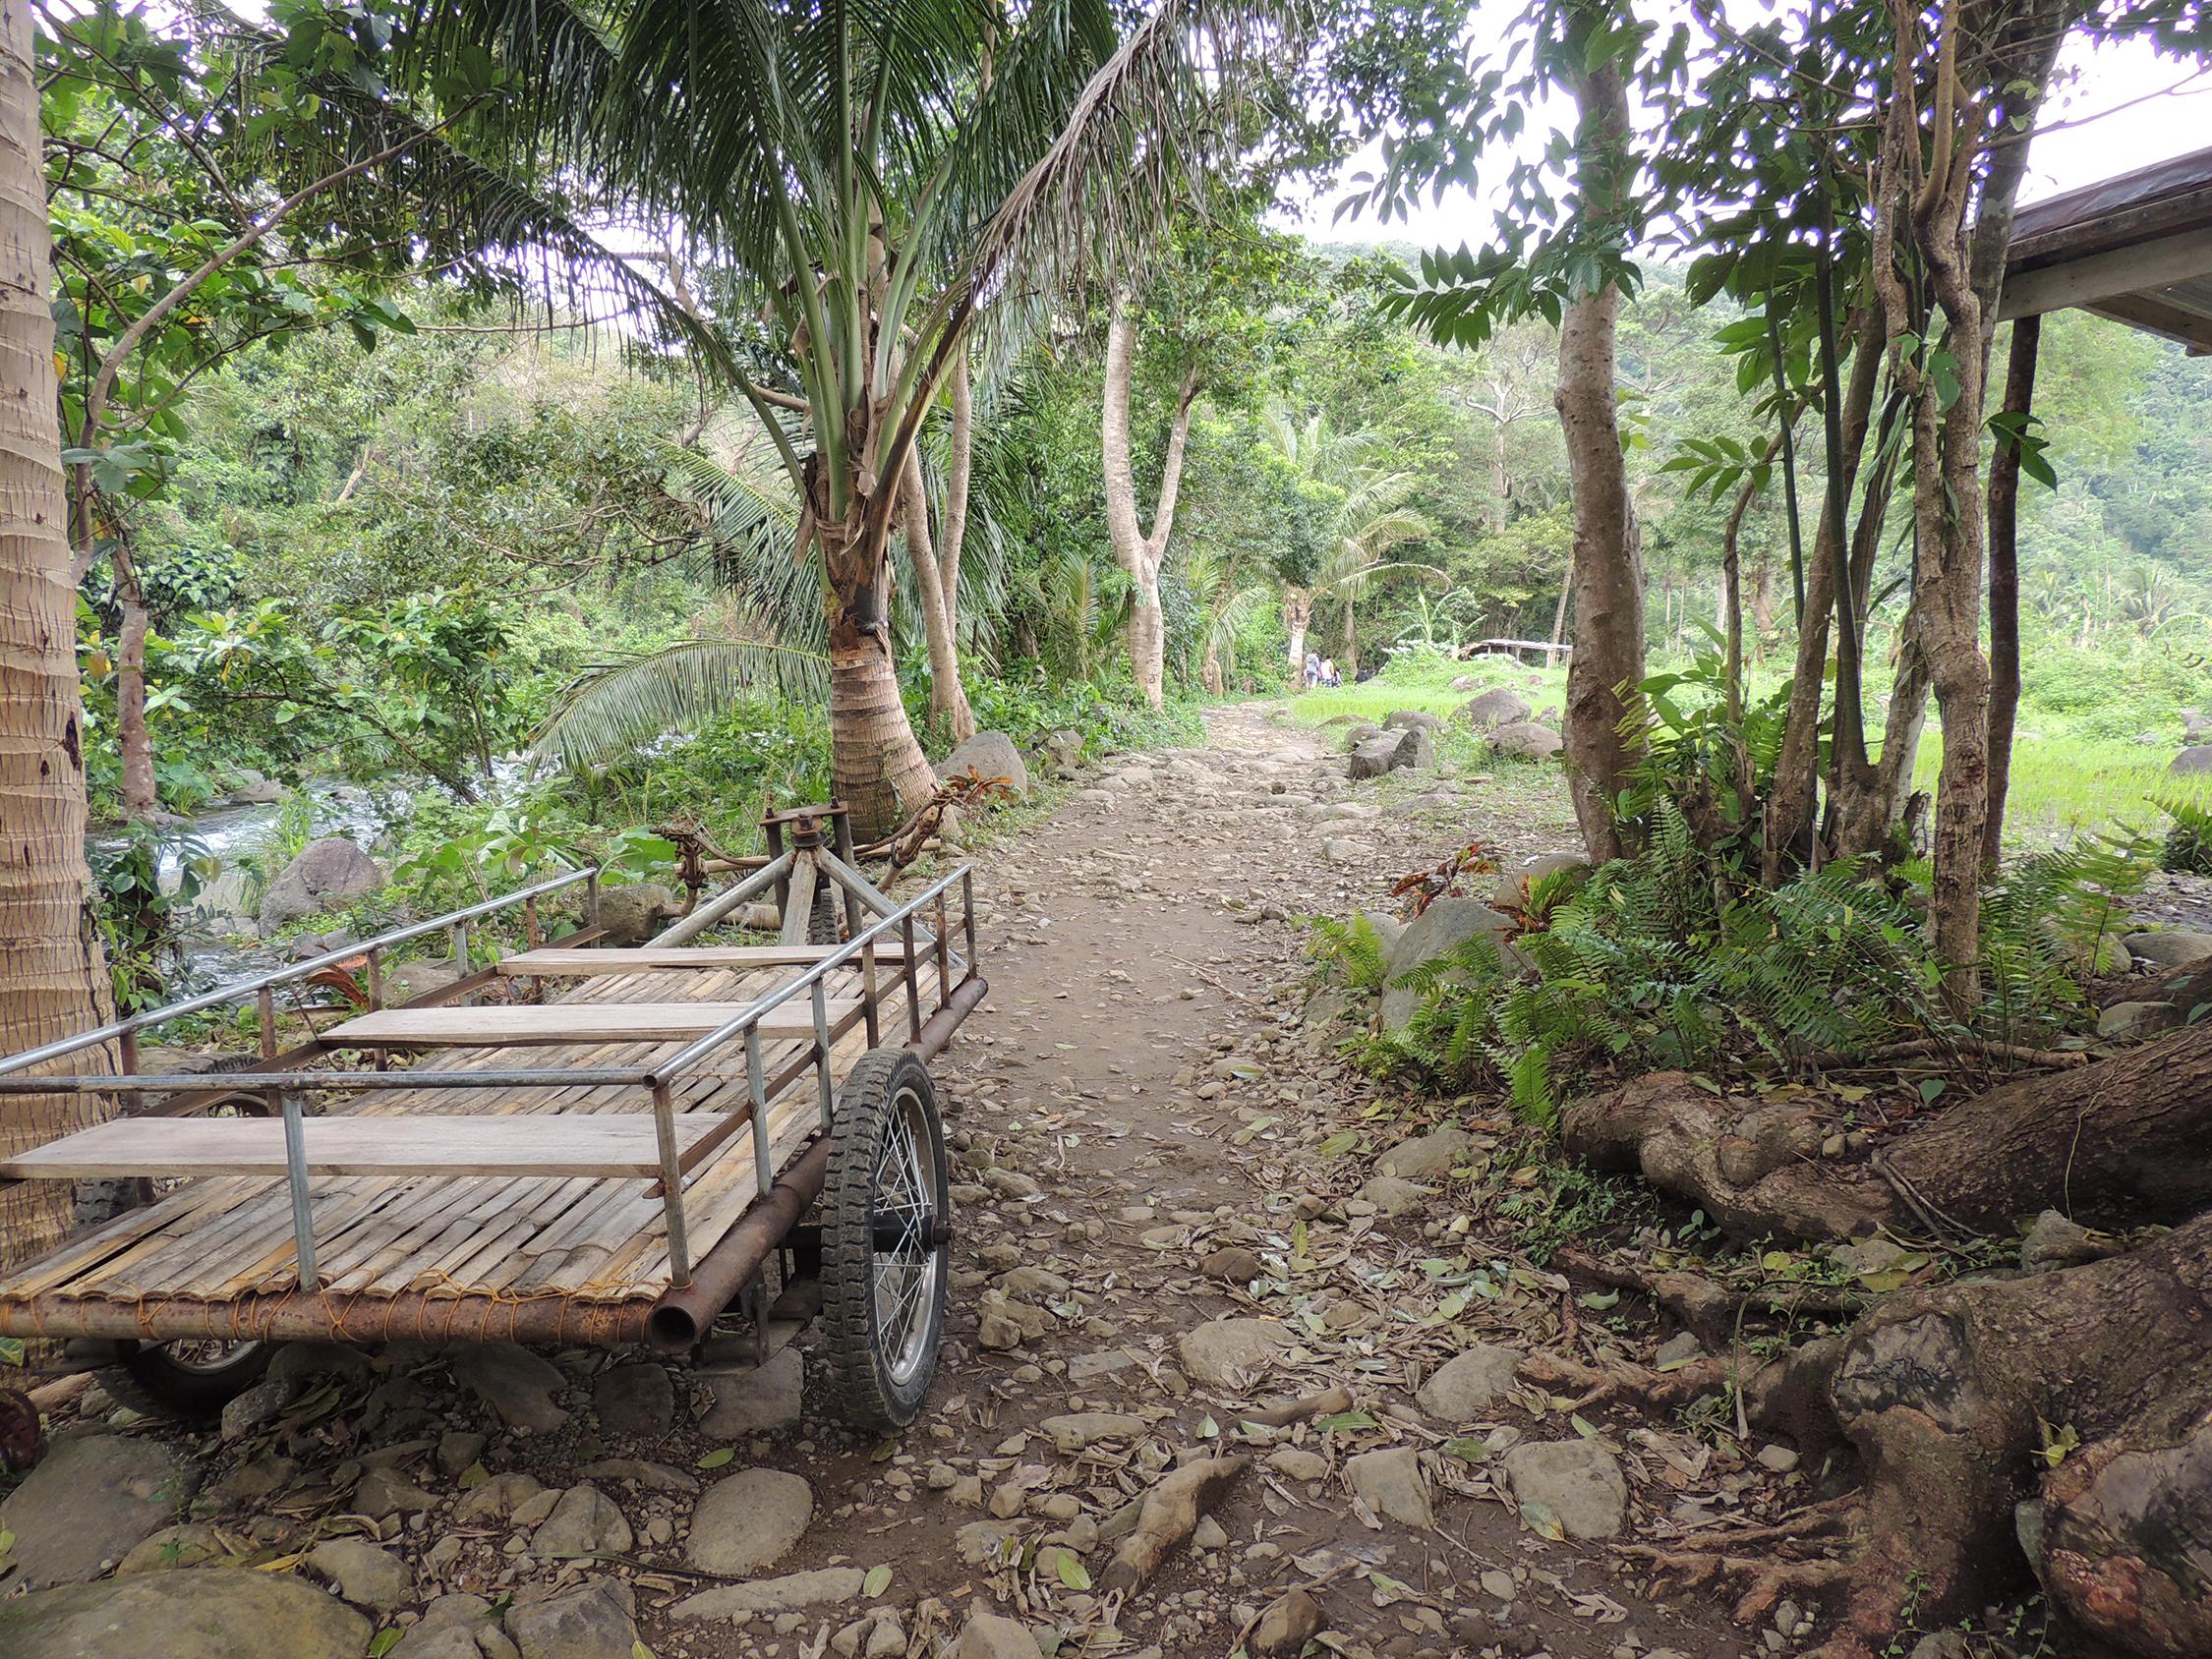 kabigan falls ilocos norte pagudpud 6.JPG